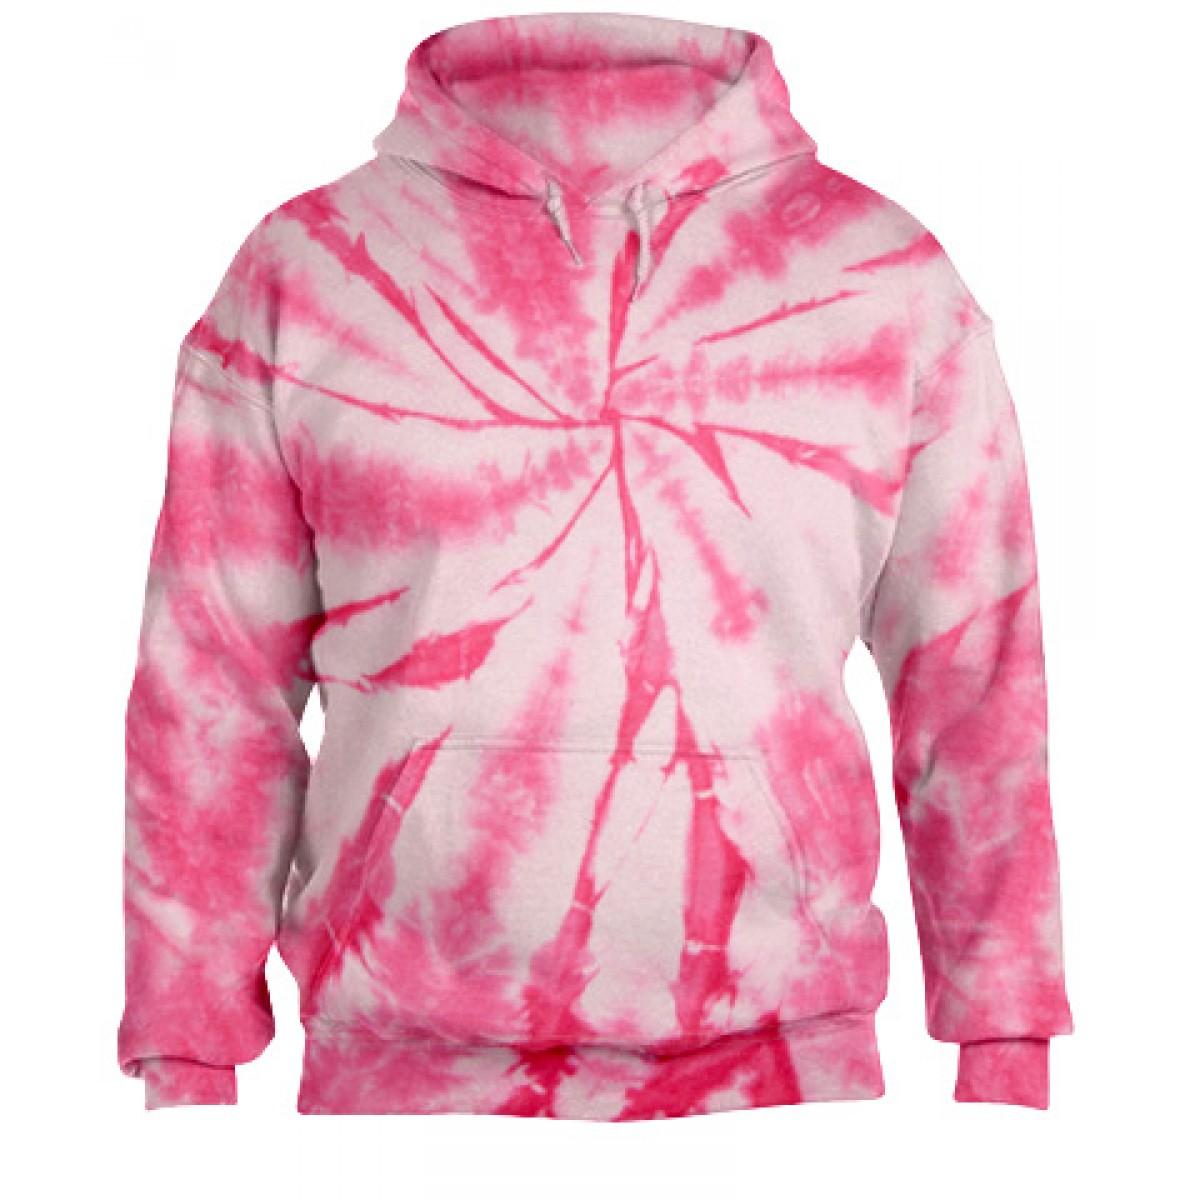 Tie-Dye Pullover Hooded Sweatshirt-Pink-3XL